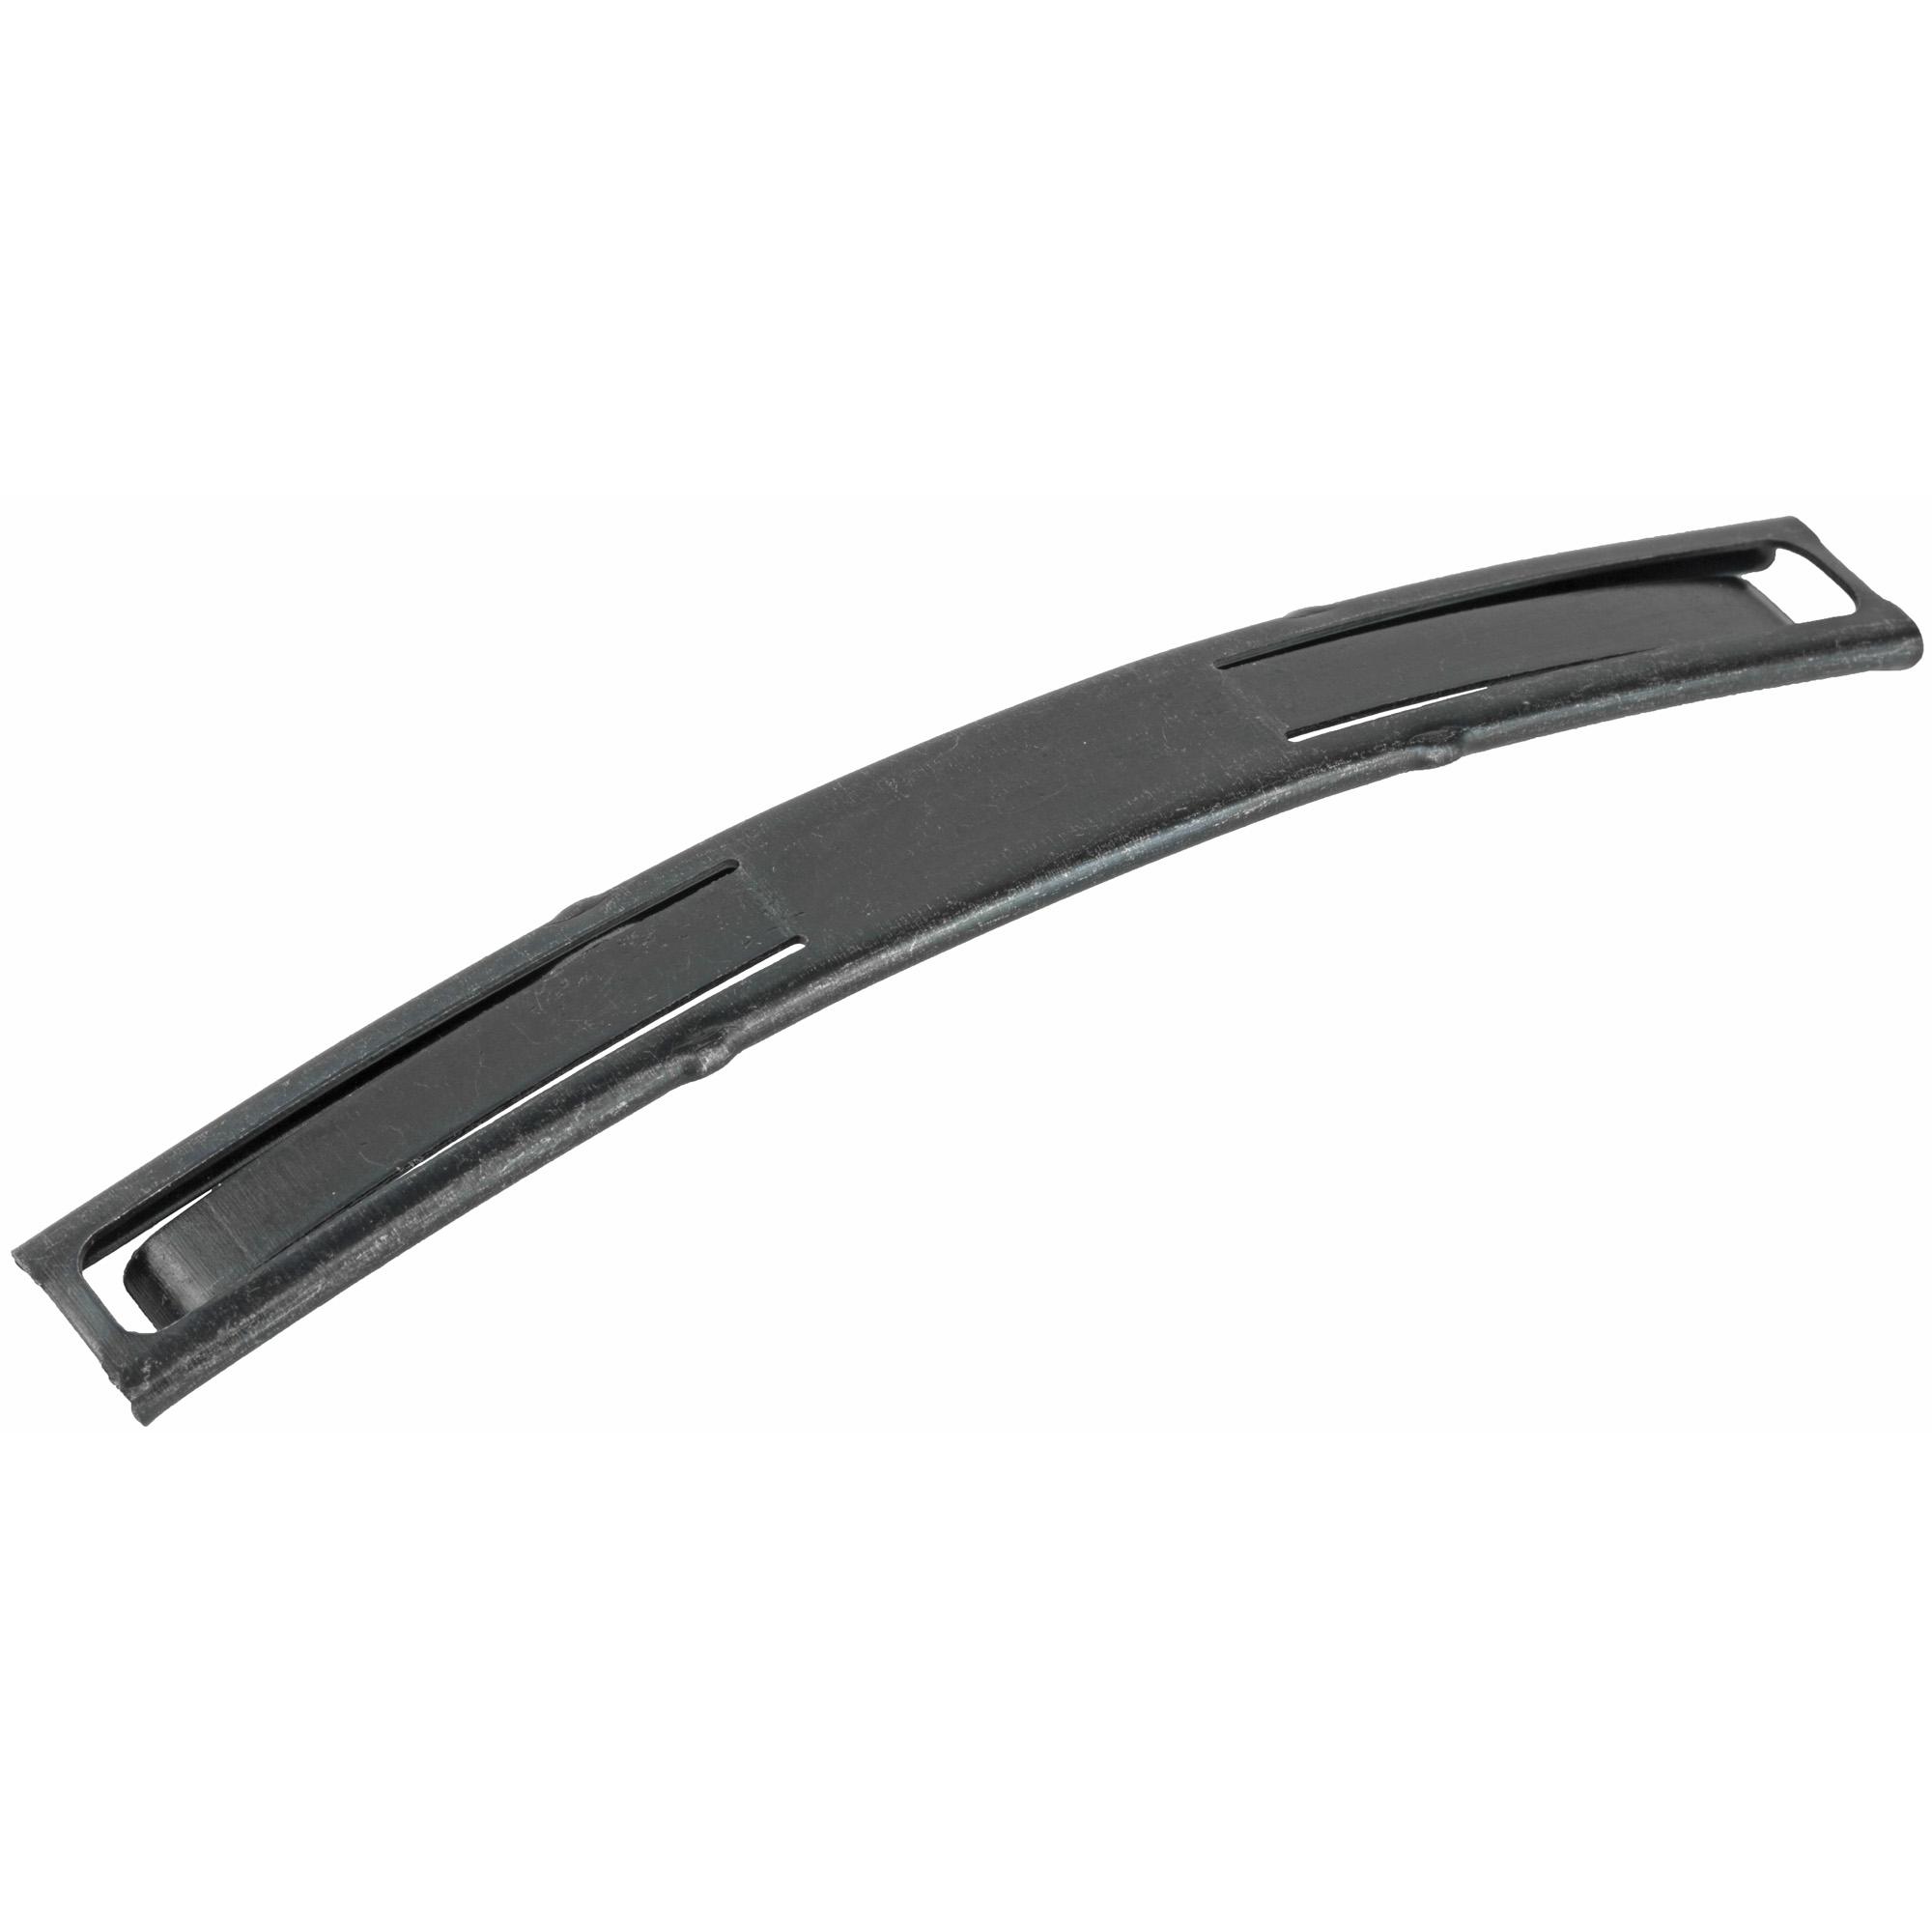 NCSTAR SKS 7.62X39 7.62X39 Stripper Clips Speed Strip 10Rd – Black